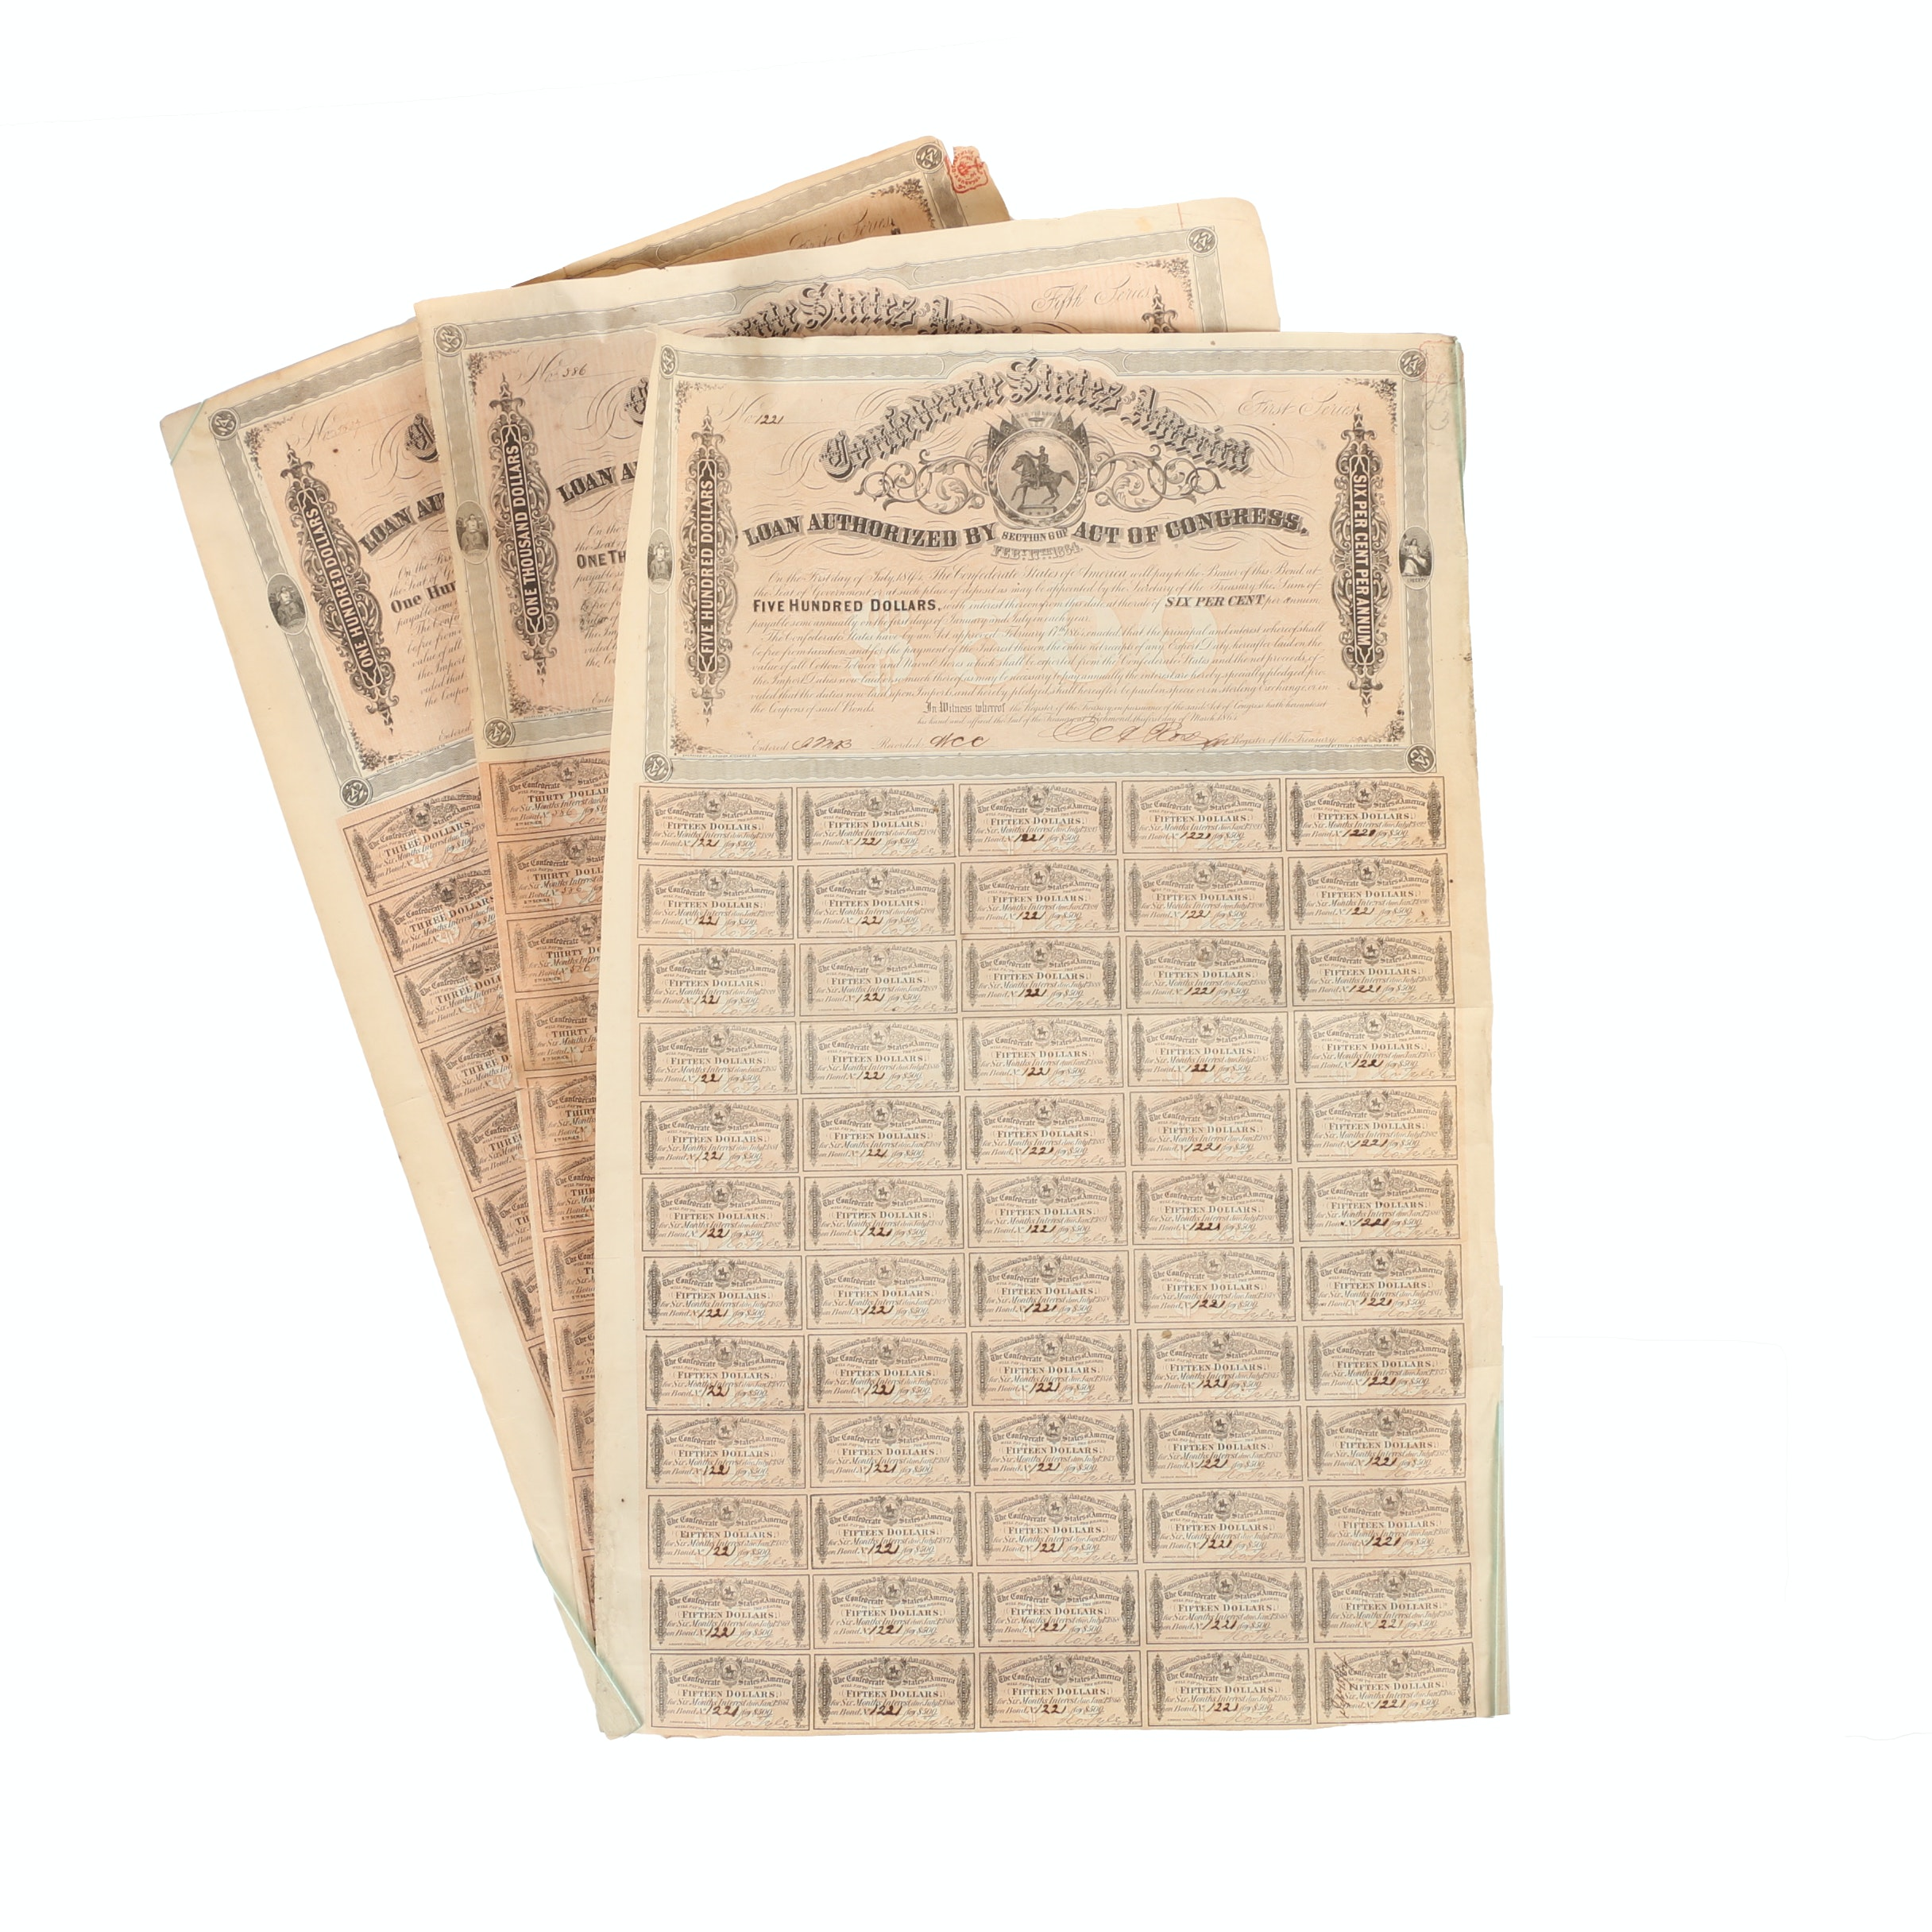 1864 Confederate States of America 1000, 500 and 100 Dollar Bonds